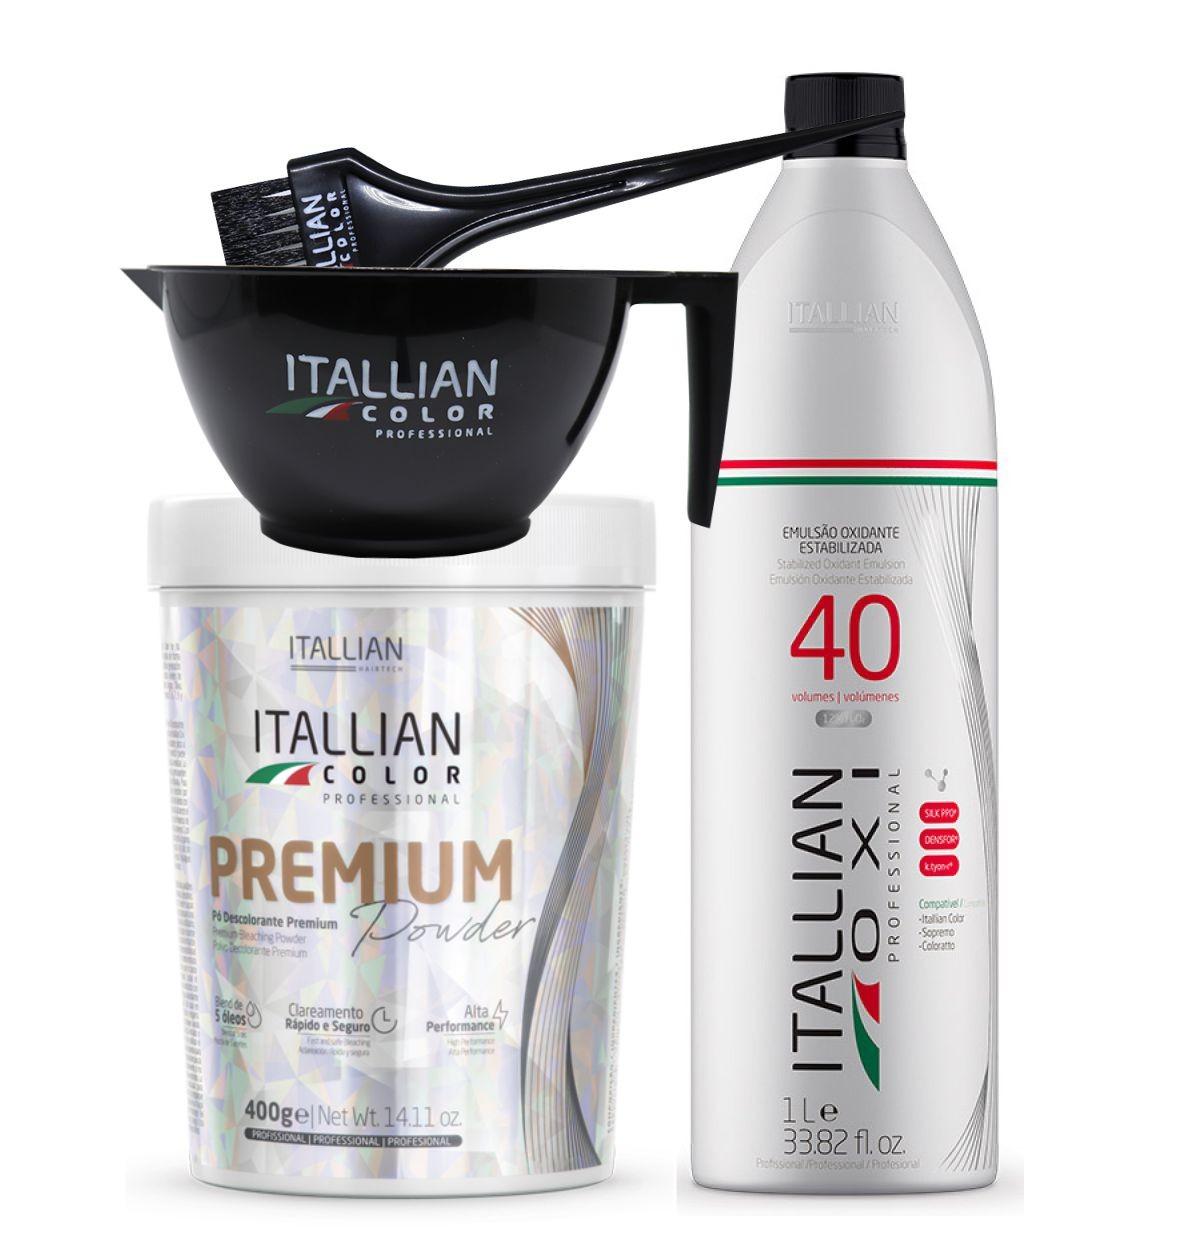 Pó Descolorante Itallian Color Premium Powder + Ox 40vol